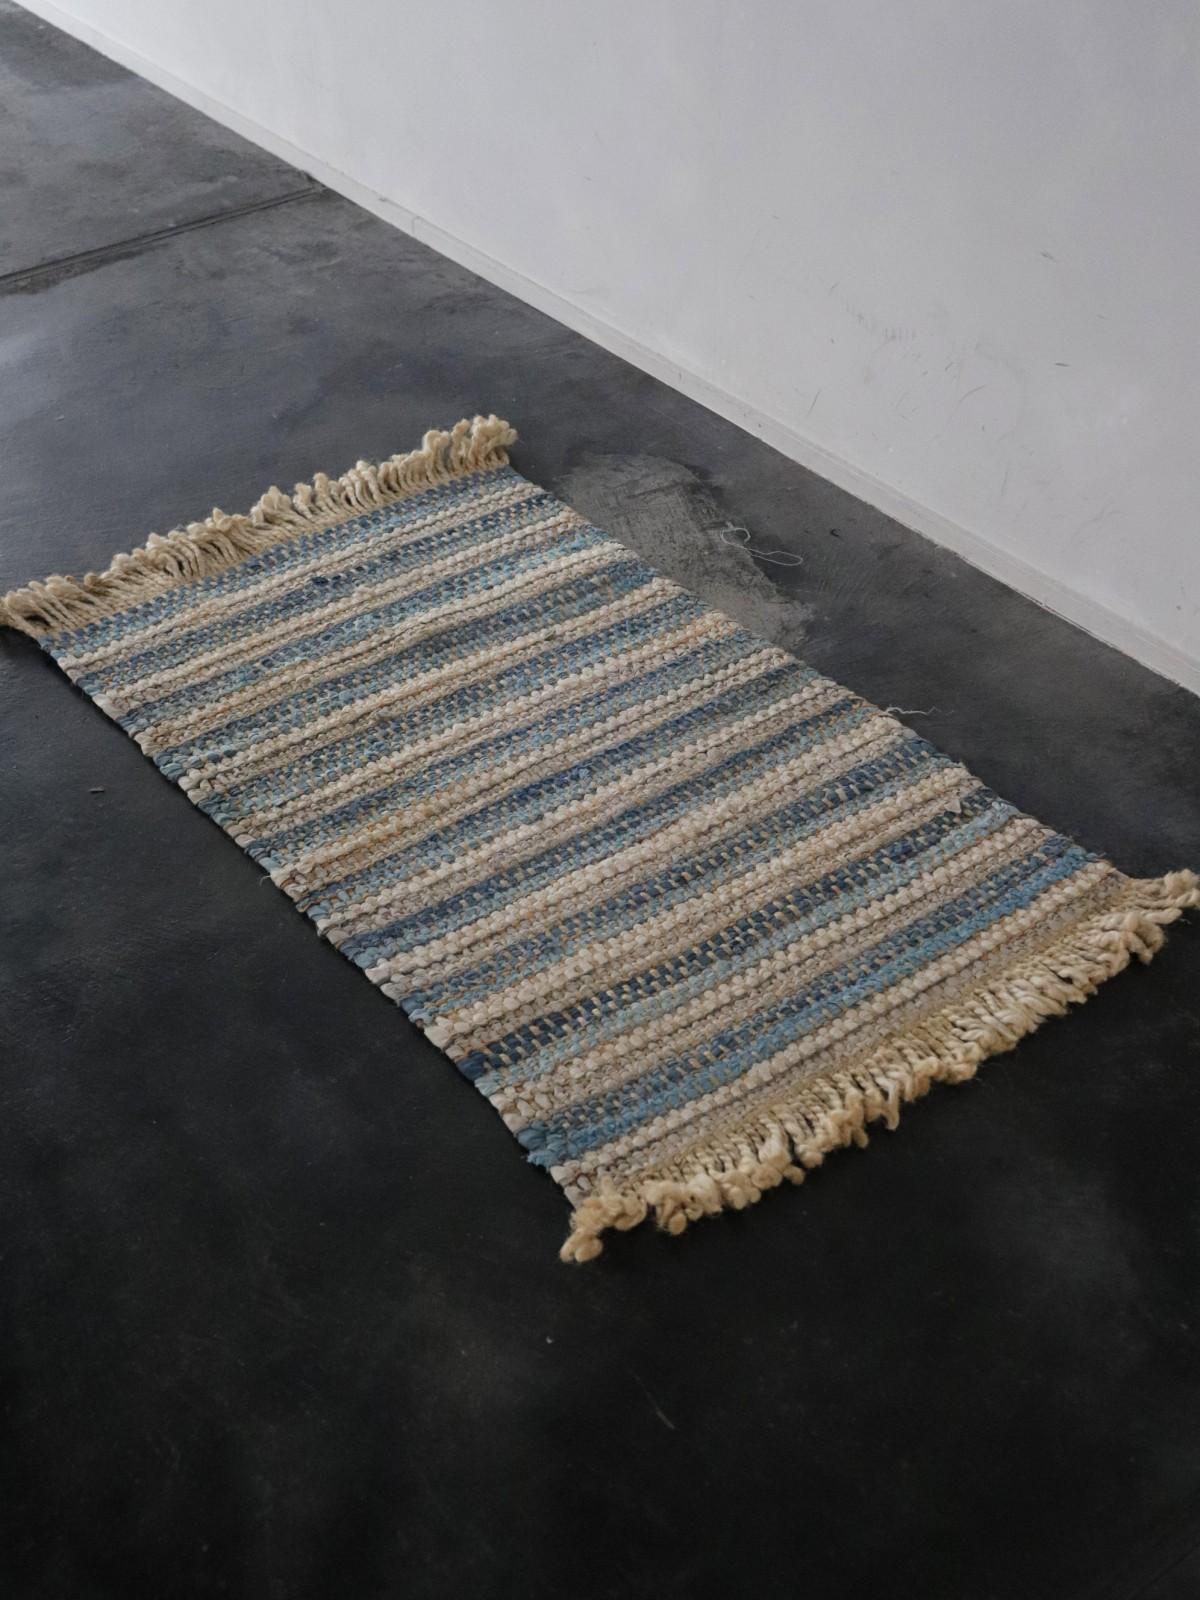 ragrug, small rug, natural fiber material